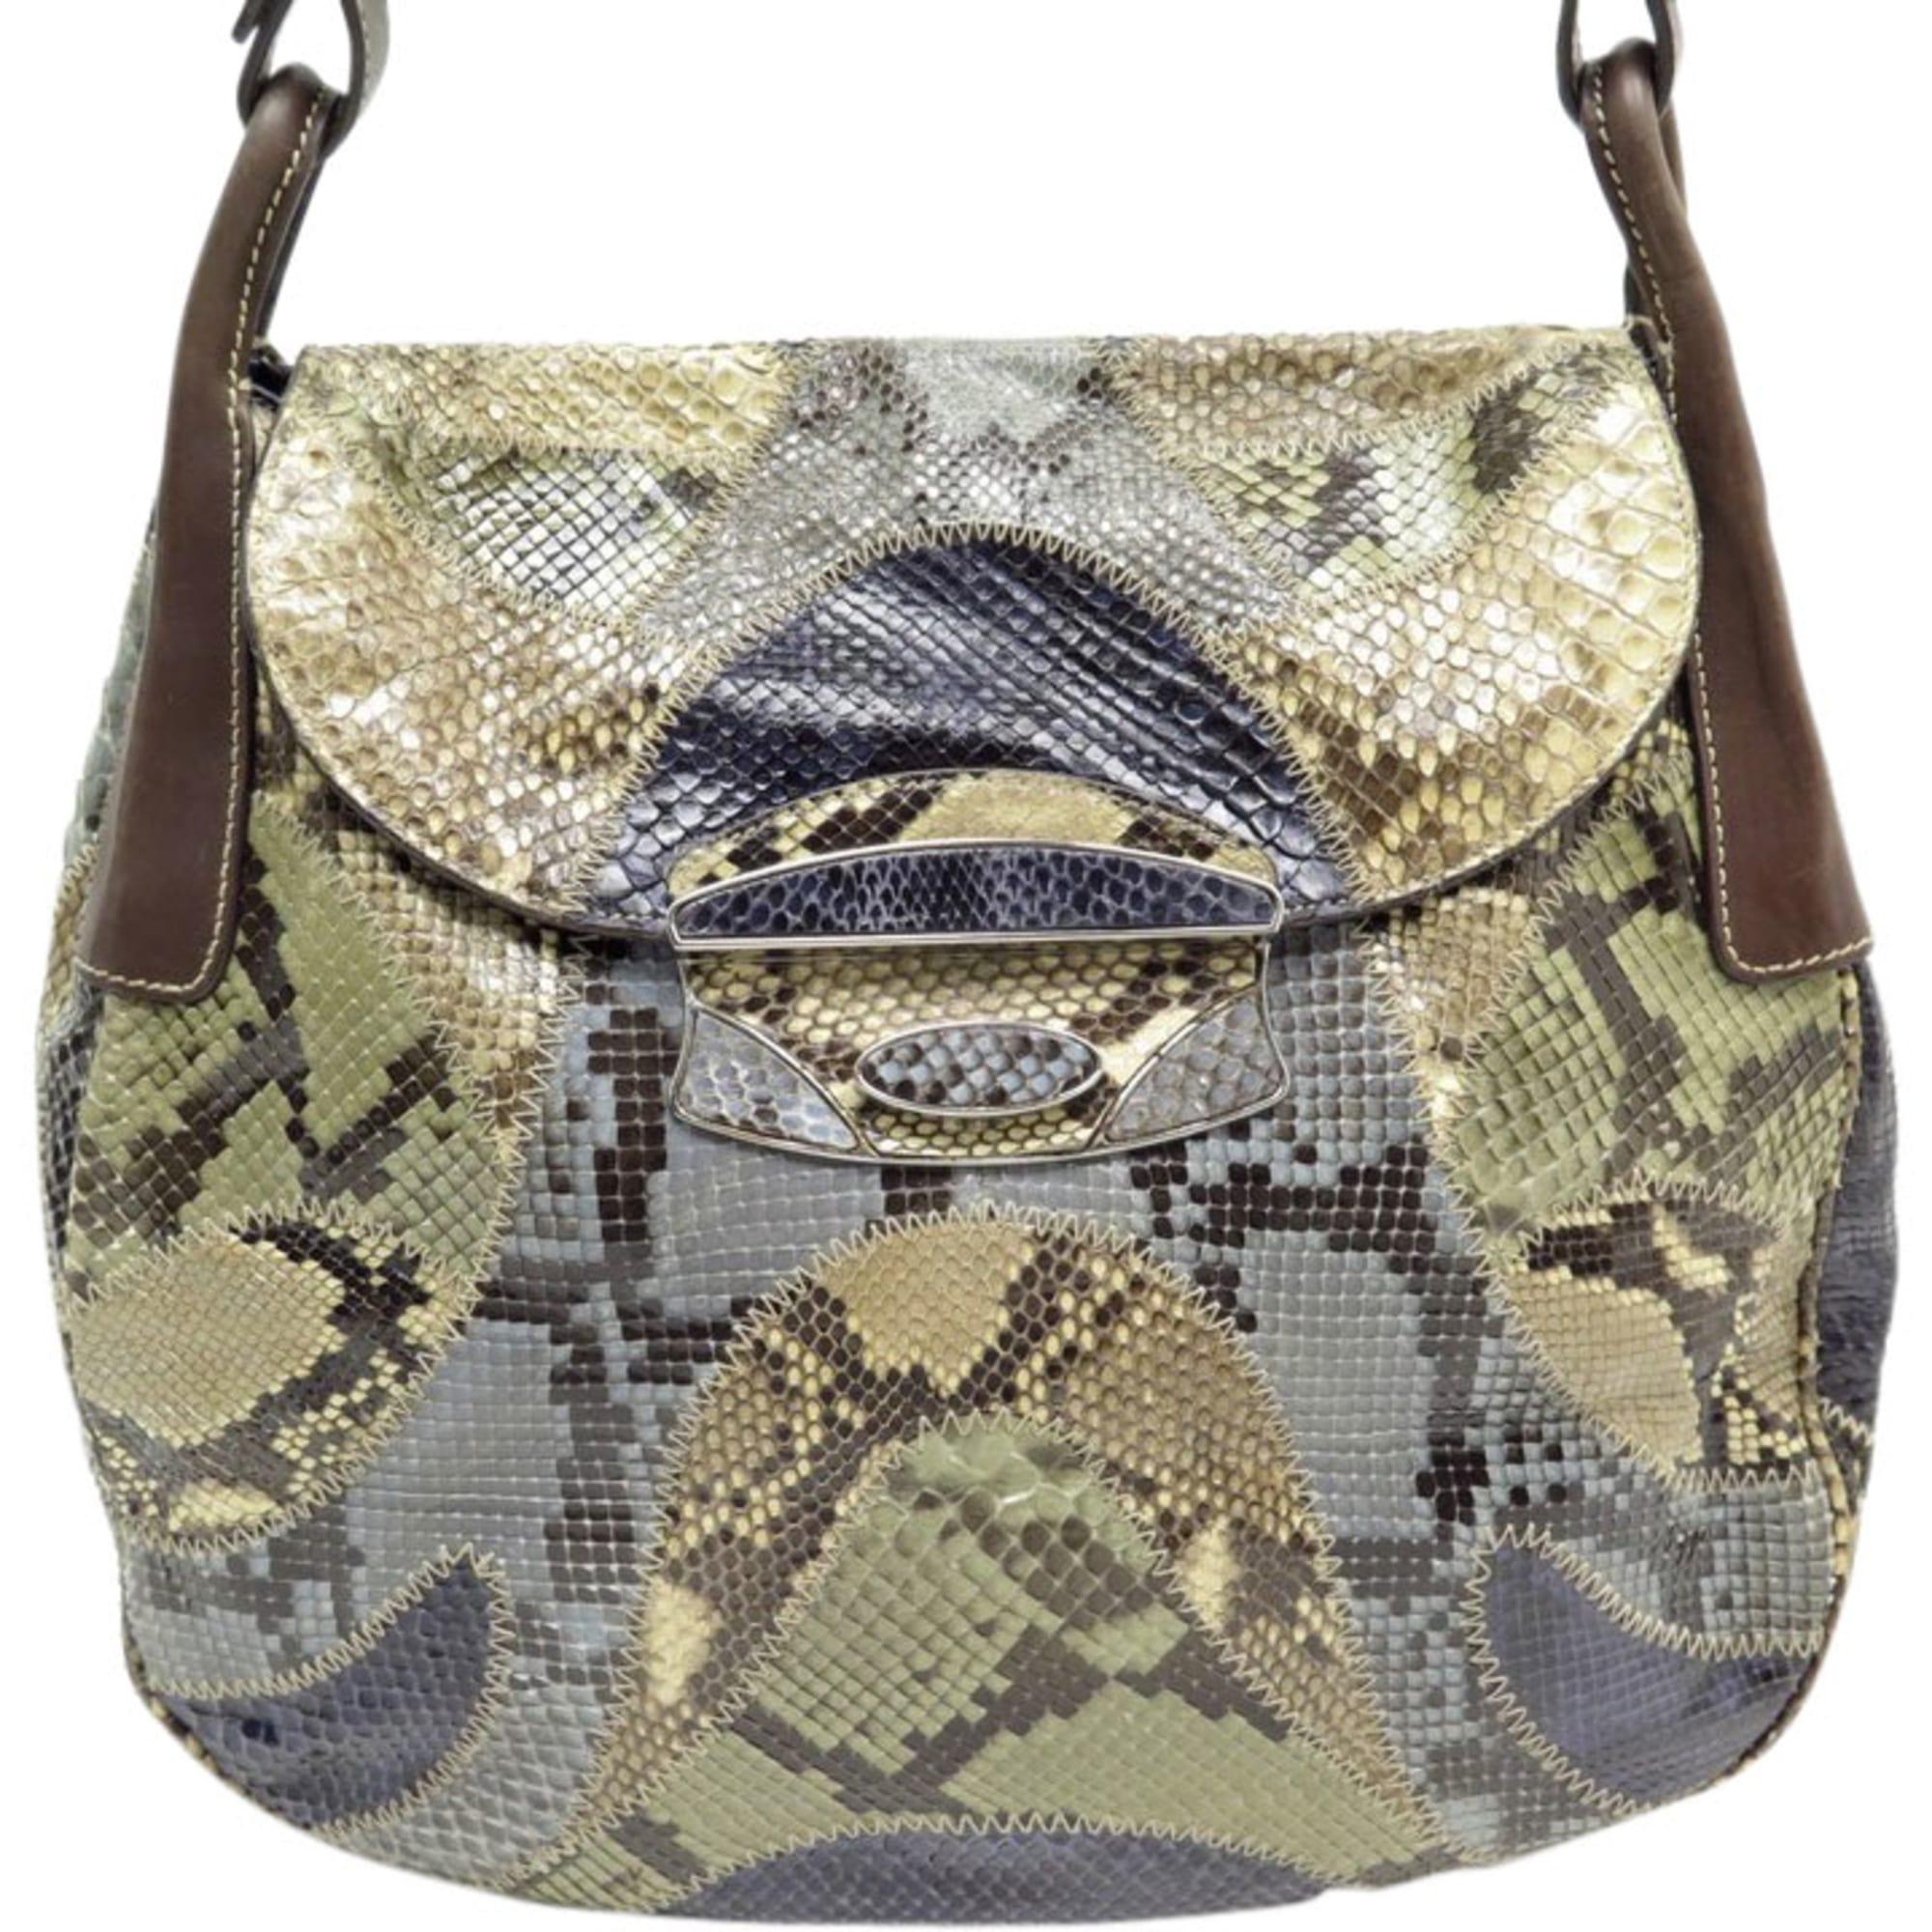 d9704678ee8d ... print pochette bag 1a493 42cc8; authentic leather handbag prada  multicolor ee57e 42897